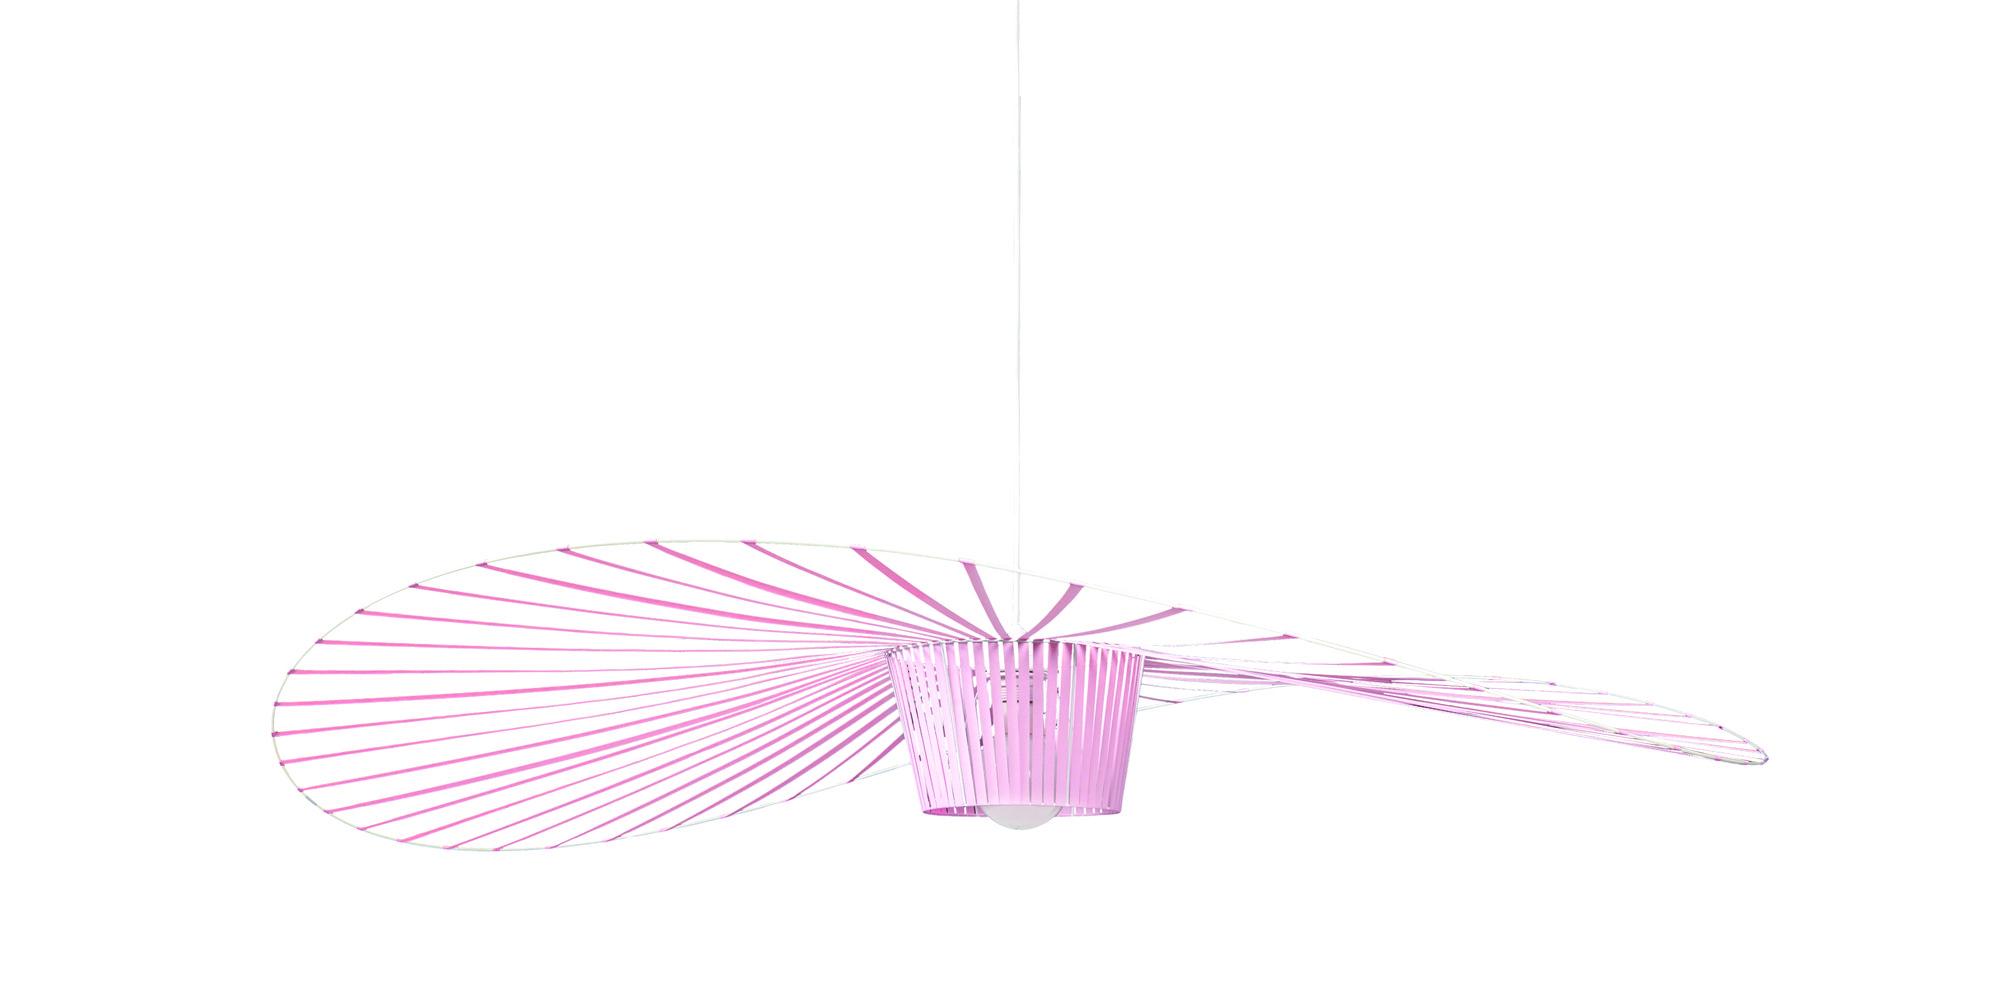 Leuchten - Pendelleuchten - Vertigo Small Pendelleuchte / Ø 140 cm - 5-Jahre-Jubiläumsedition - Petite Friture - Hellrosa - Glasfaser, Polyurhethan